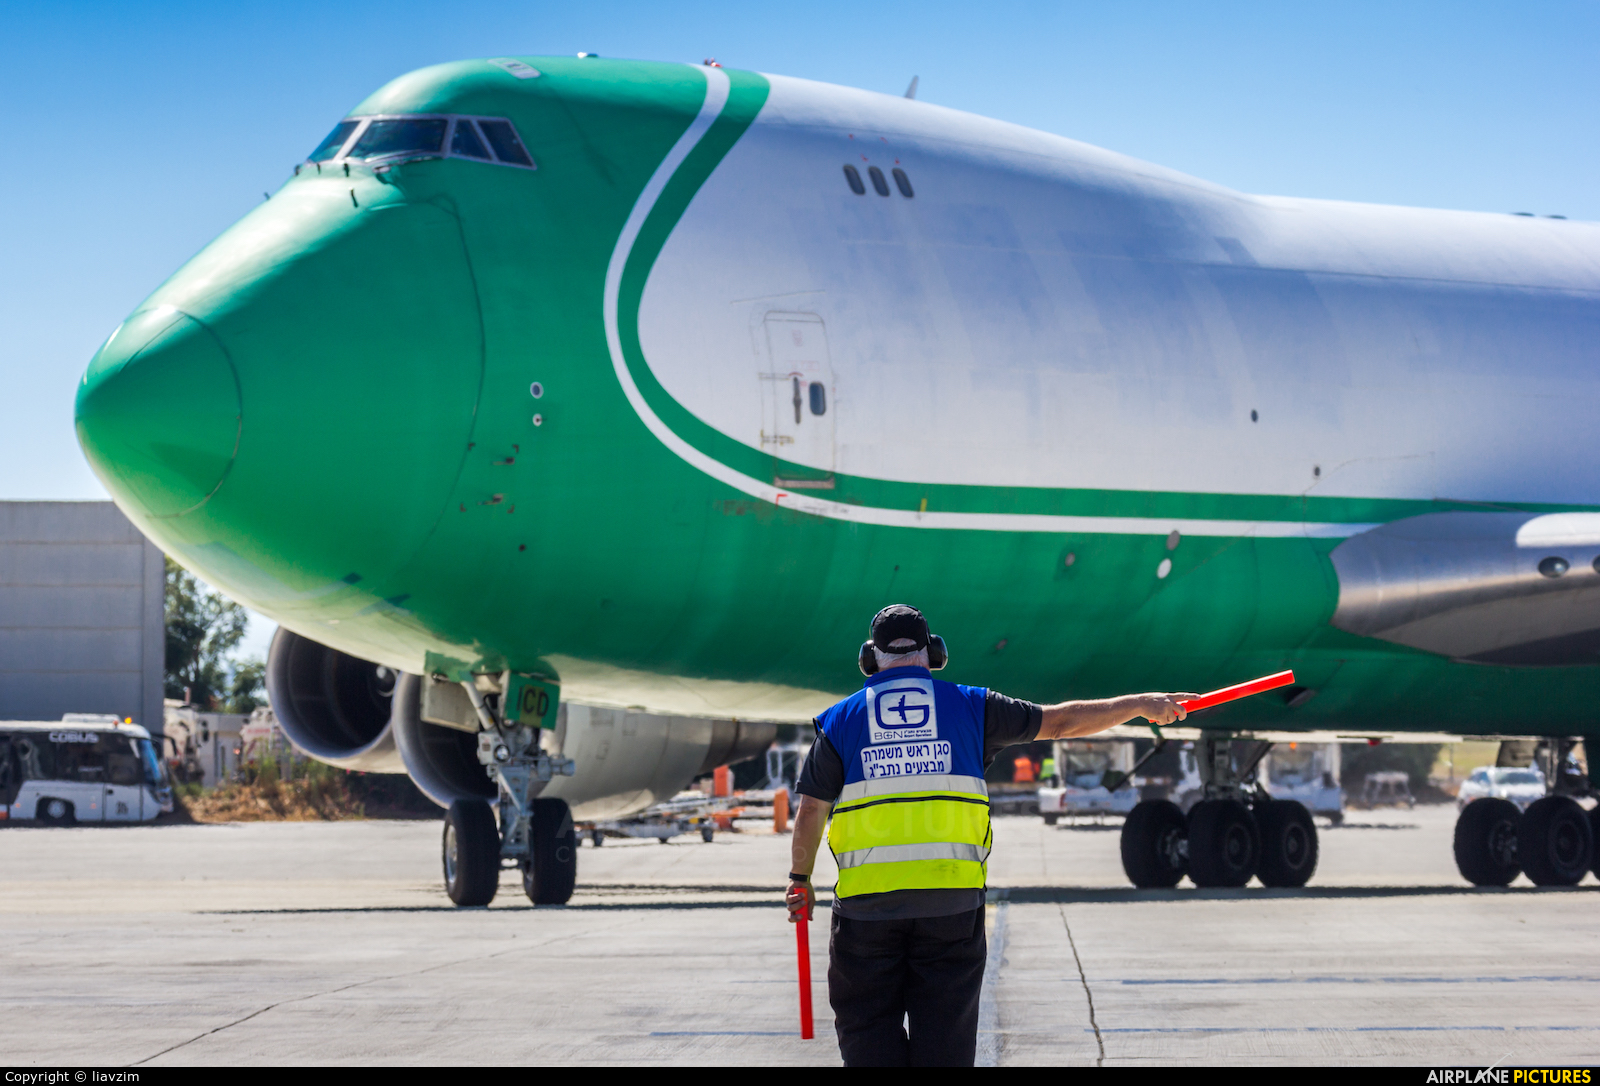 CAL - Cargo Air Lines 4X-ICD aircraft at Tel Aviv - Ben Gurion